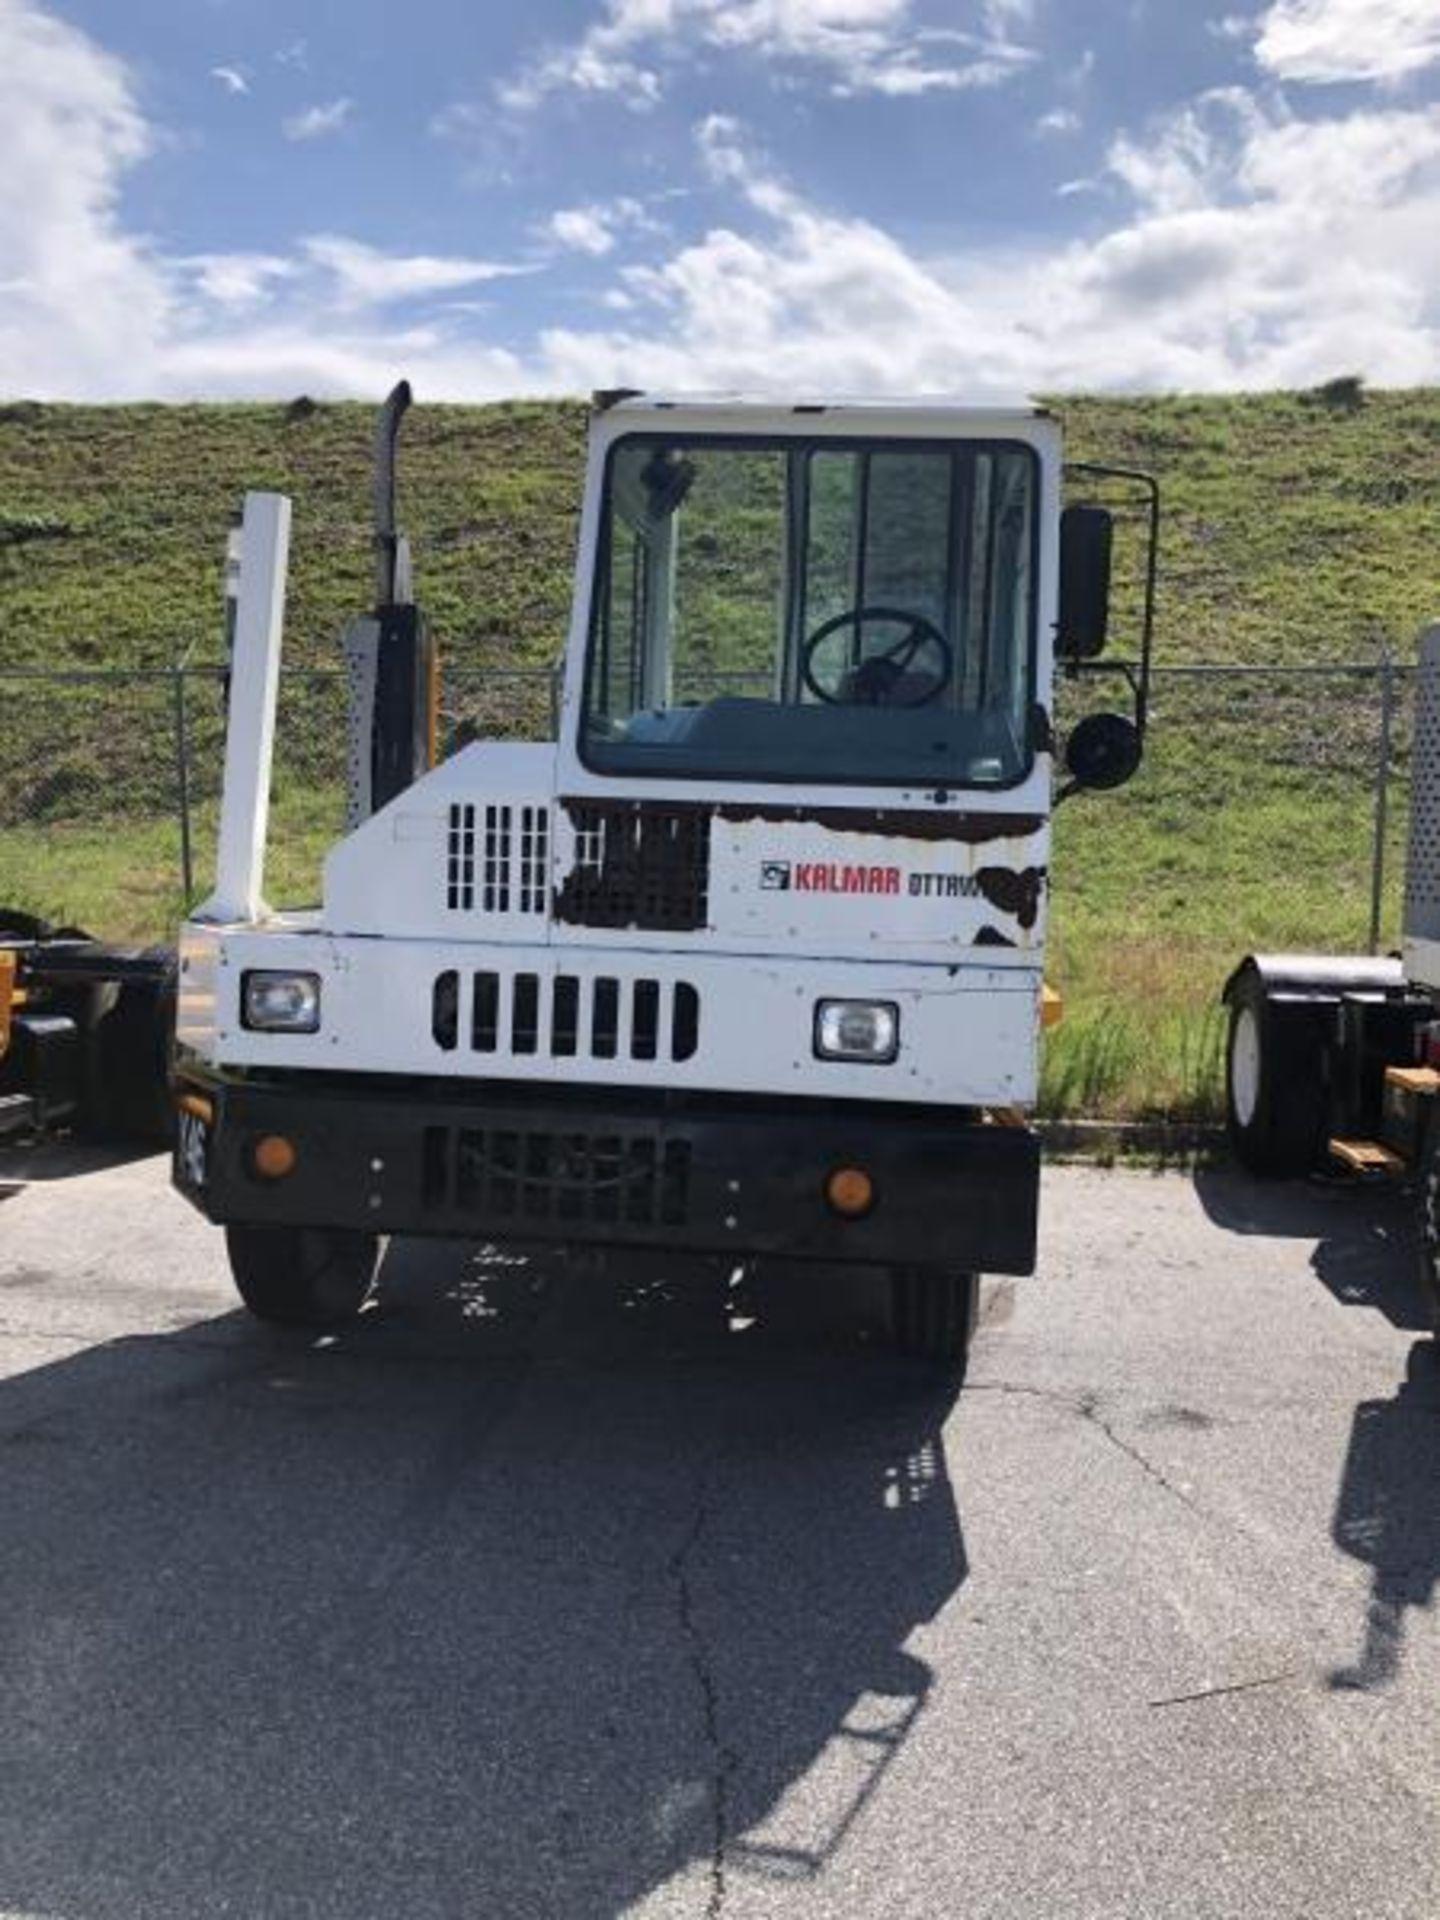 """2015 Kalmar Ottawa 4x2 Yard Truck , SN: 338840 4,378.6 Hours, 1,886 Miles - Image 35 of 36"